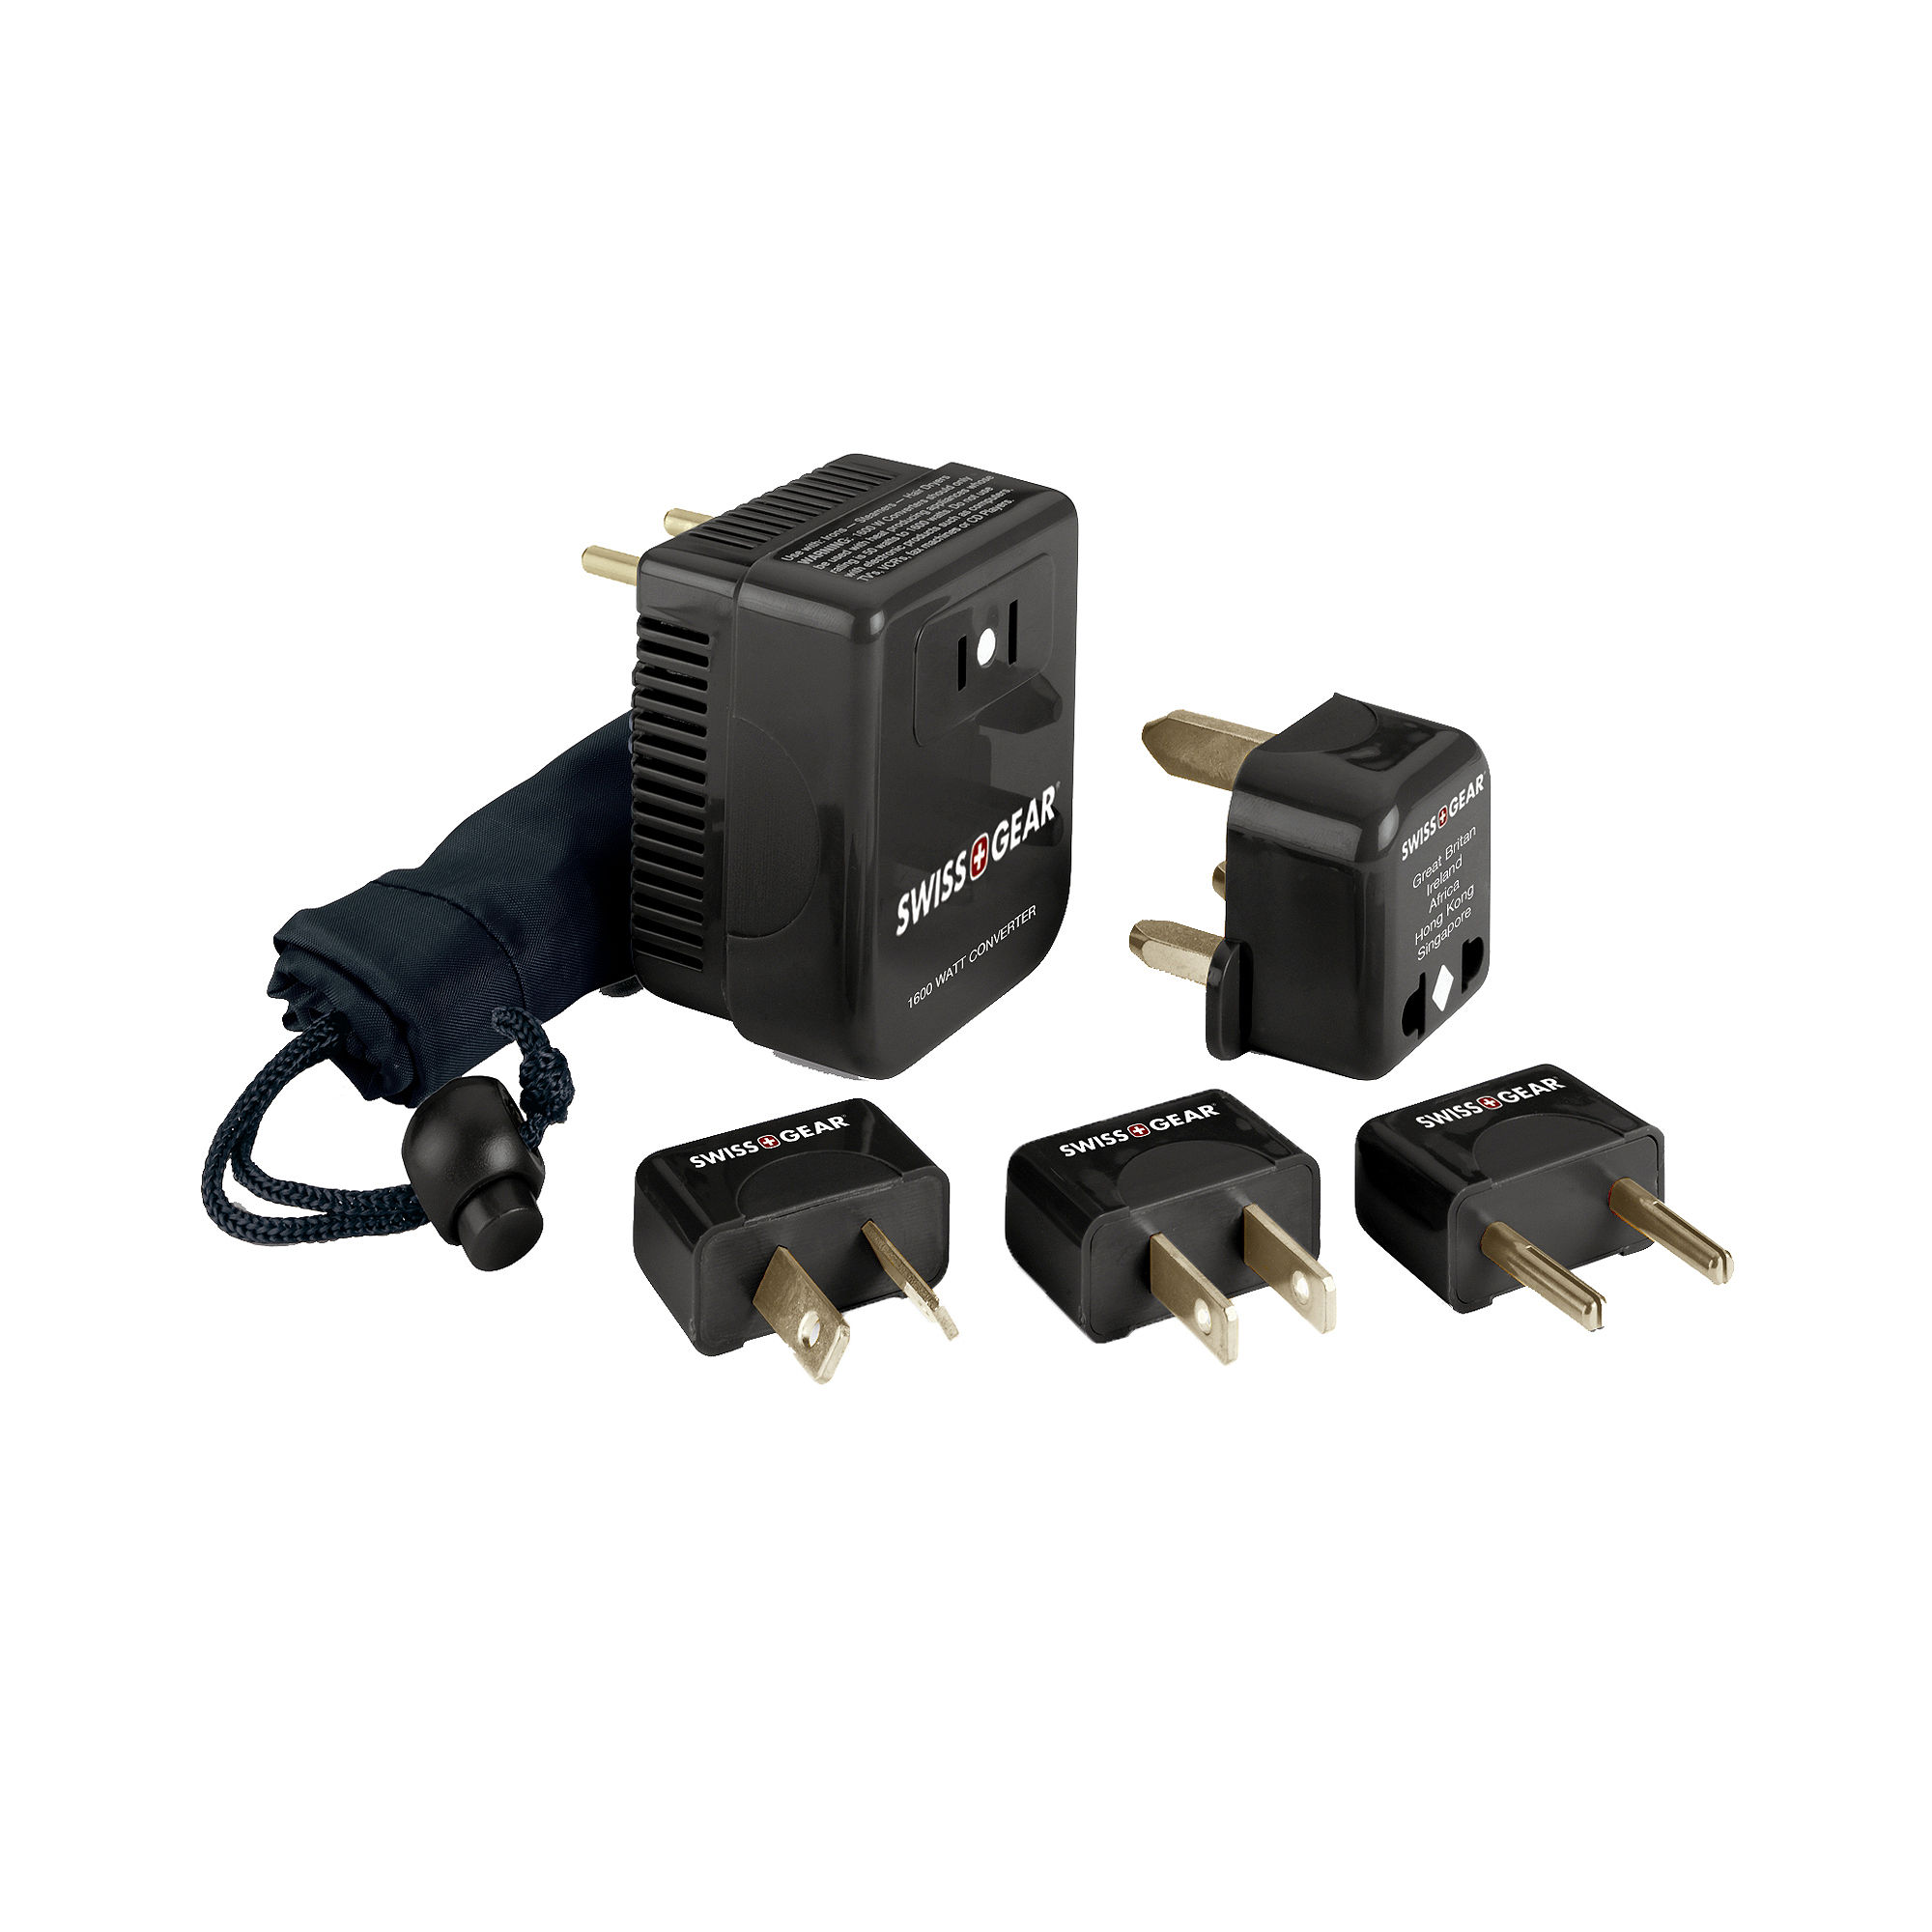 SwissGear Converter Adaptor Plug Kit